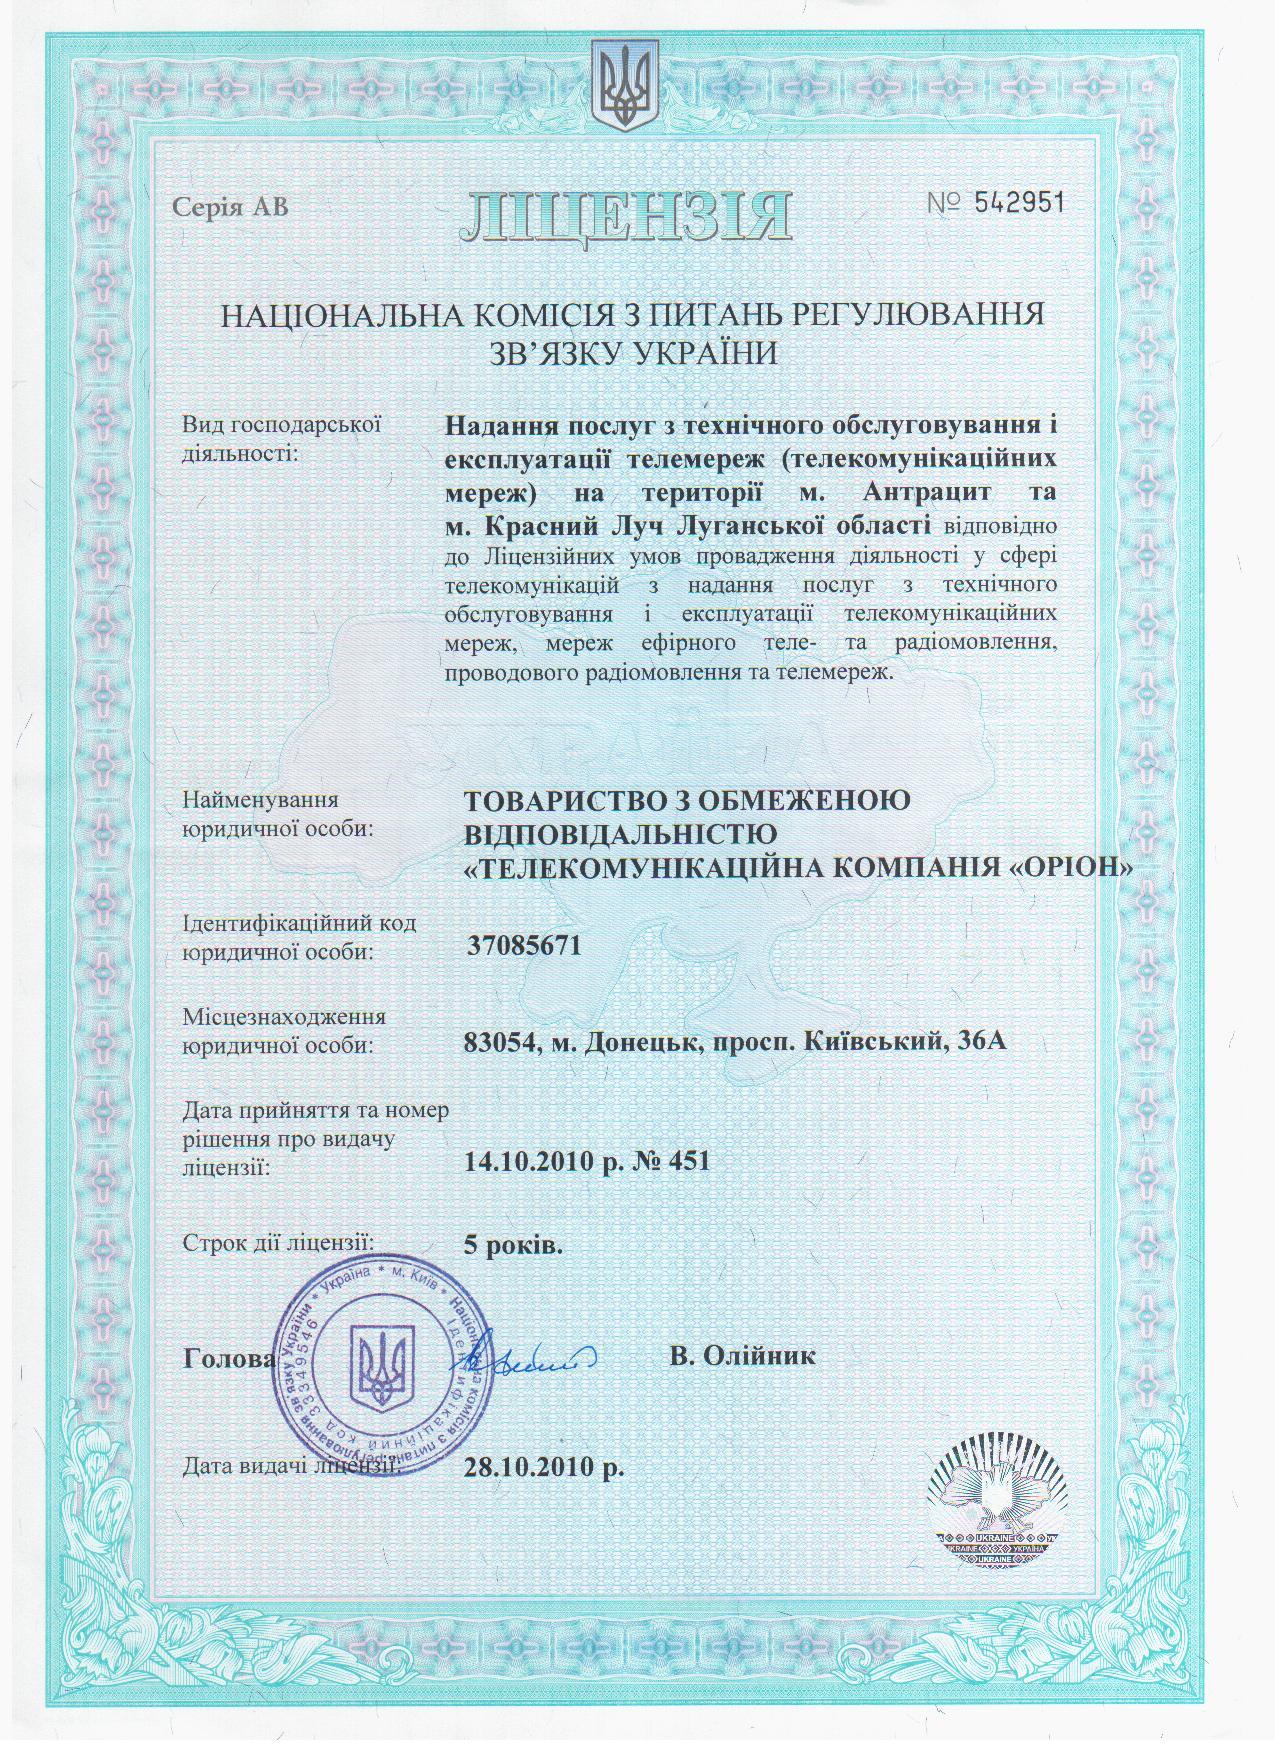 license_hkrz.jpg